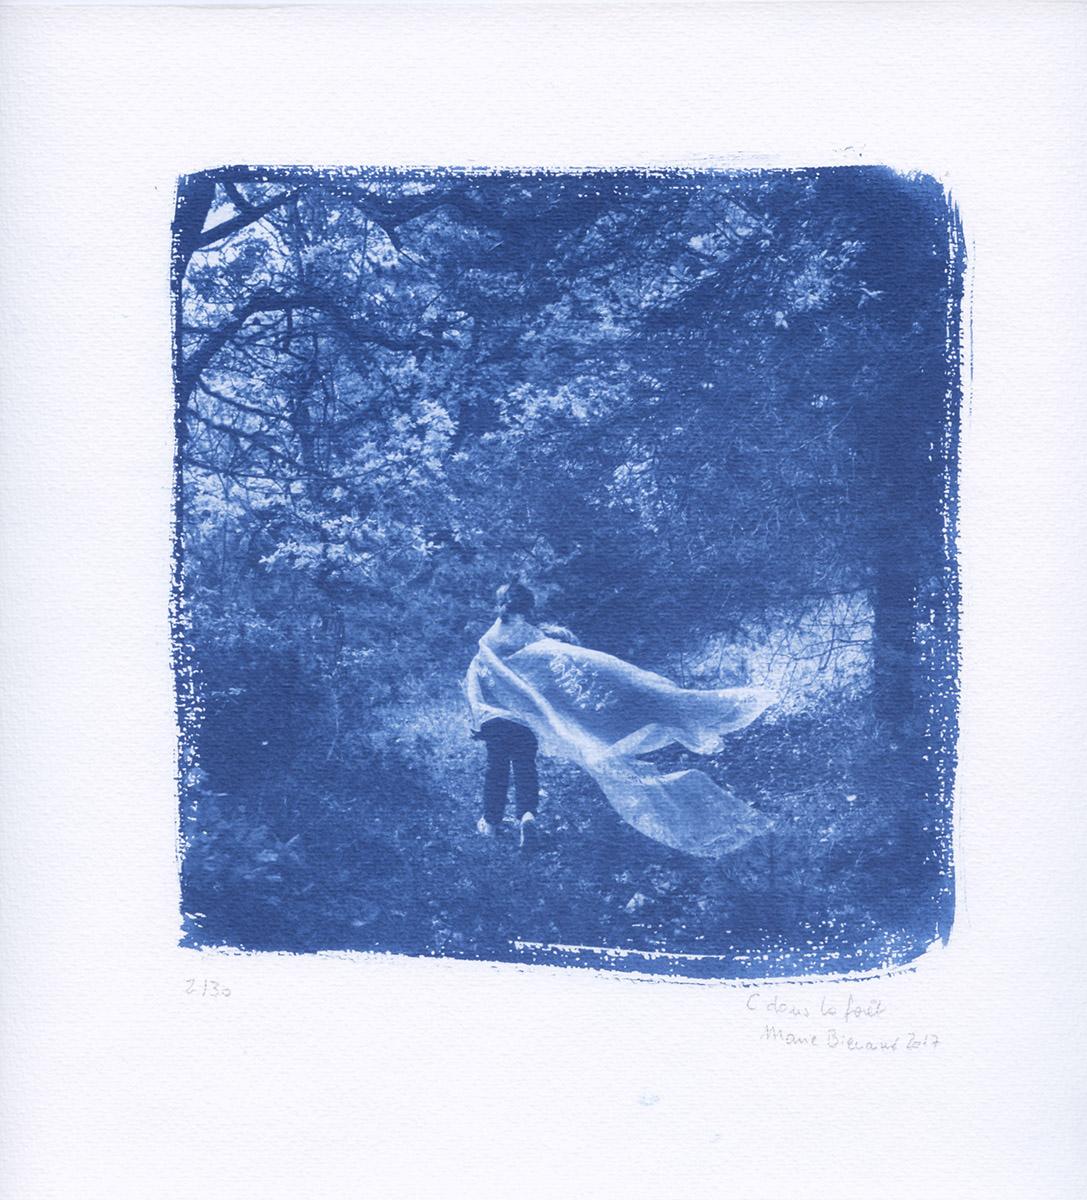 Marie bienaime artiste photographe, photographe lyon, festival photo, phemina, fontainebleau, cyanotype, exposition, art, poésie, amour